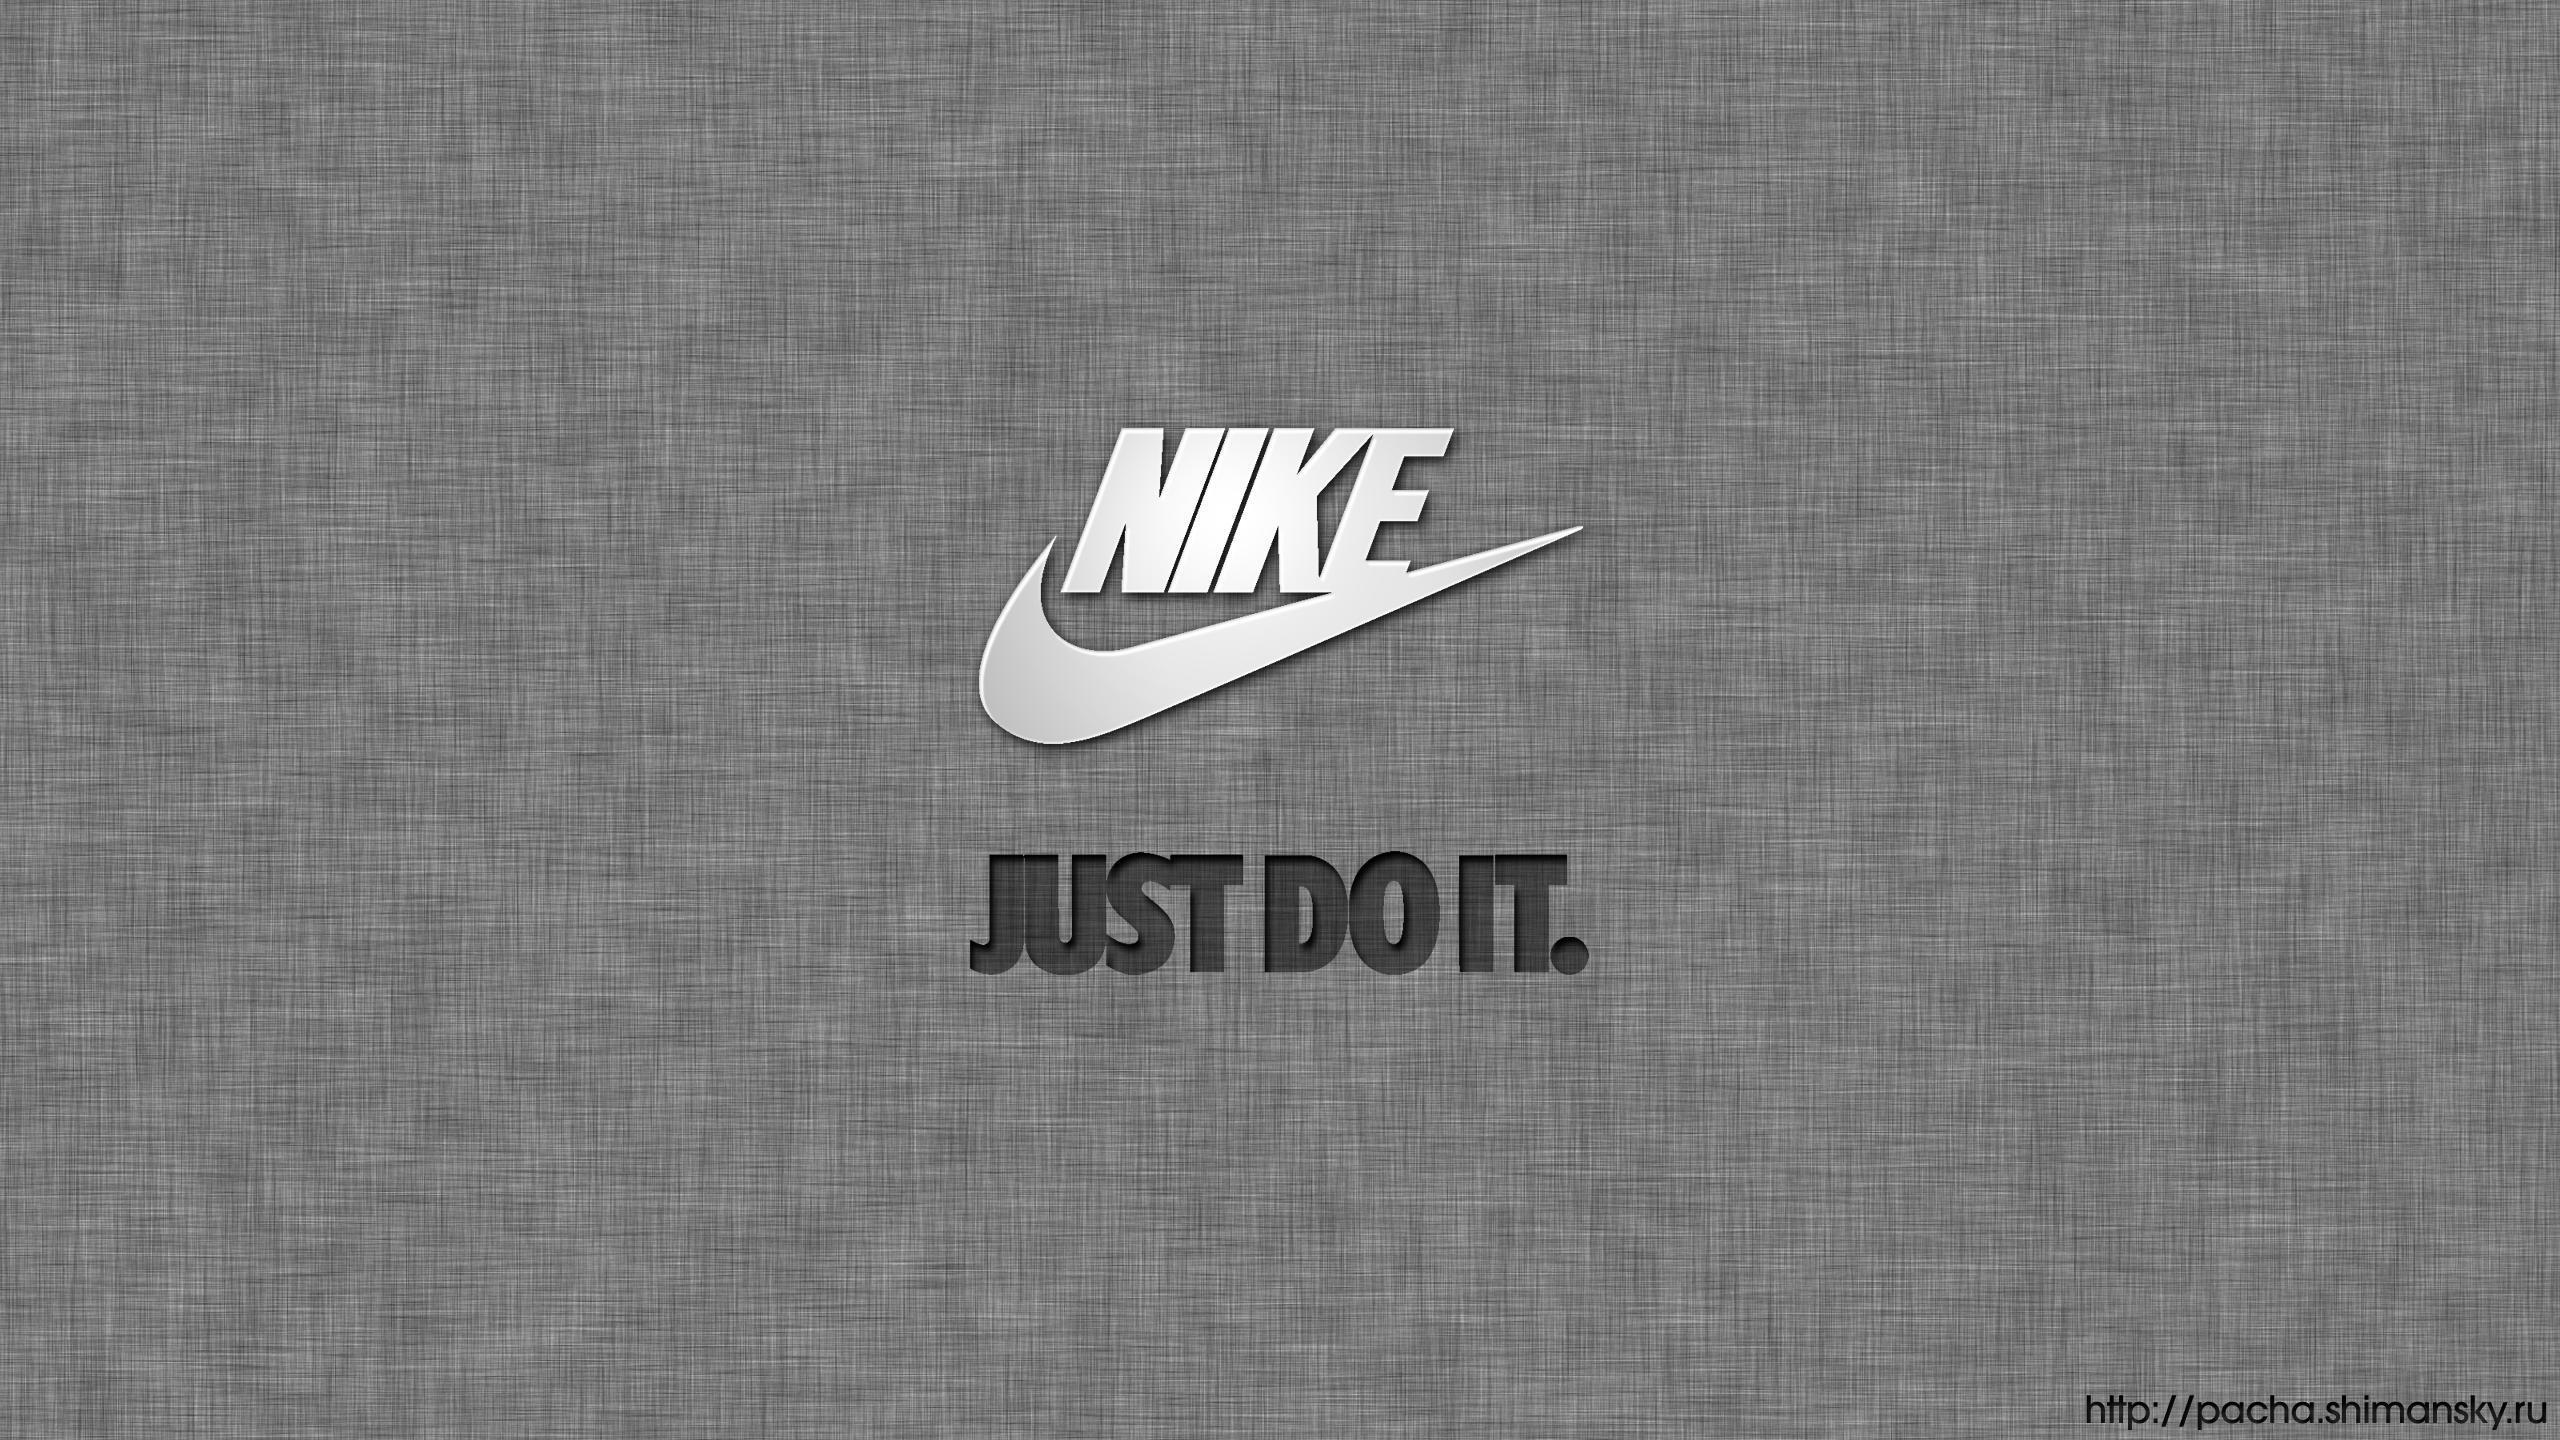 Nike Logo Wallpapers Hd 2017 Wallpaper Cave